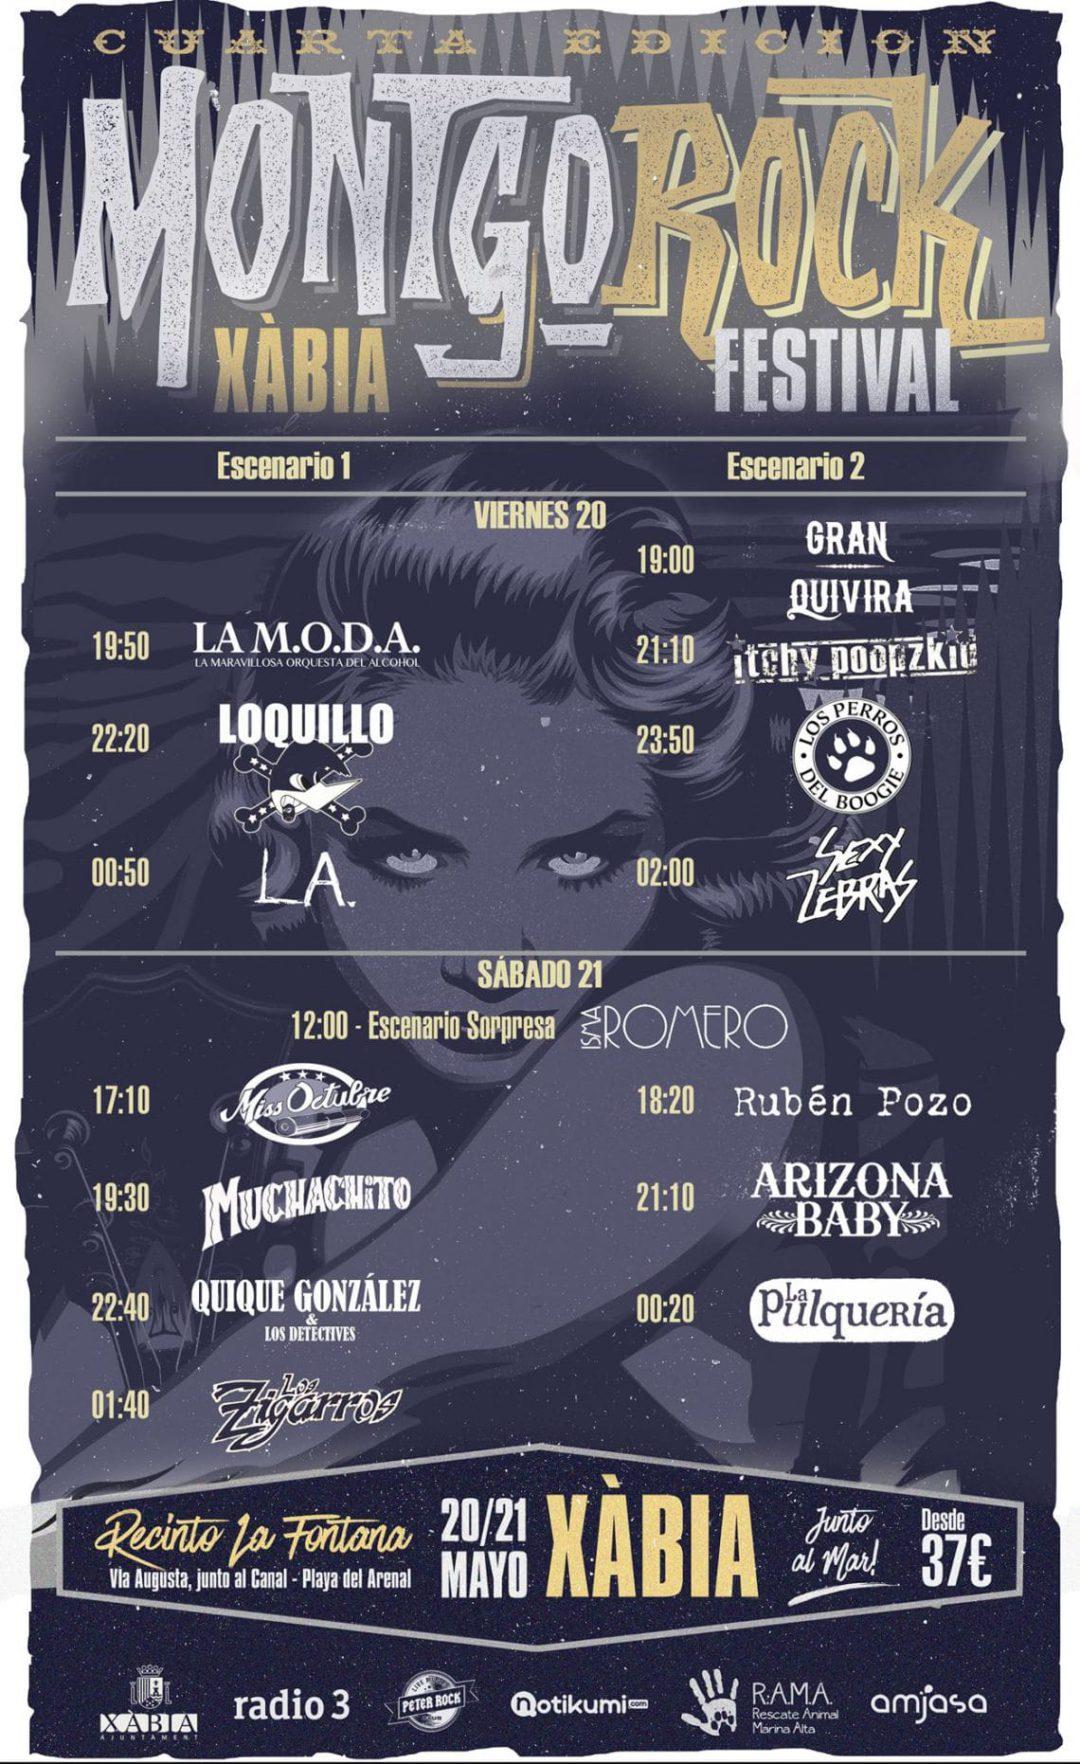 Montgó Rock Xàbia Festival 2016